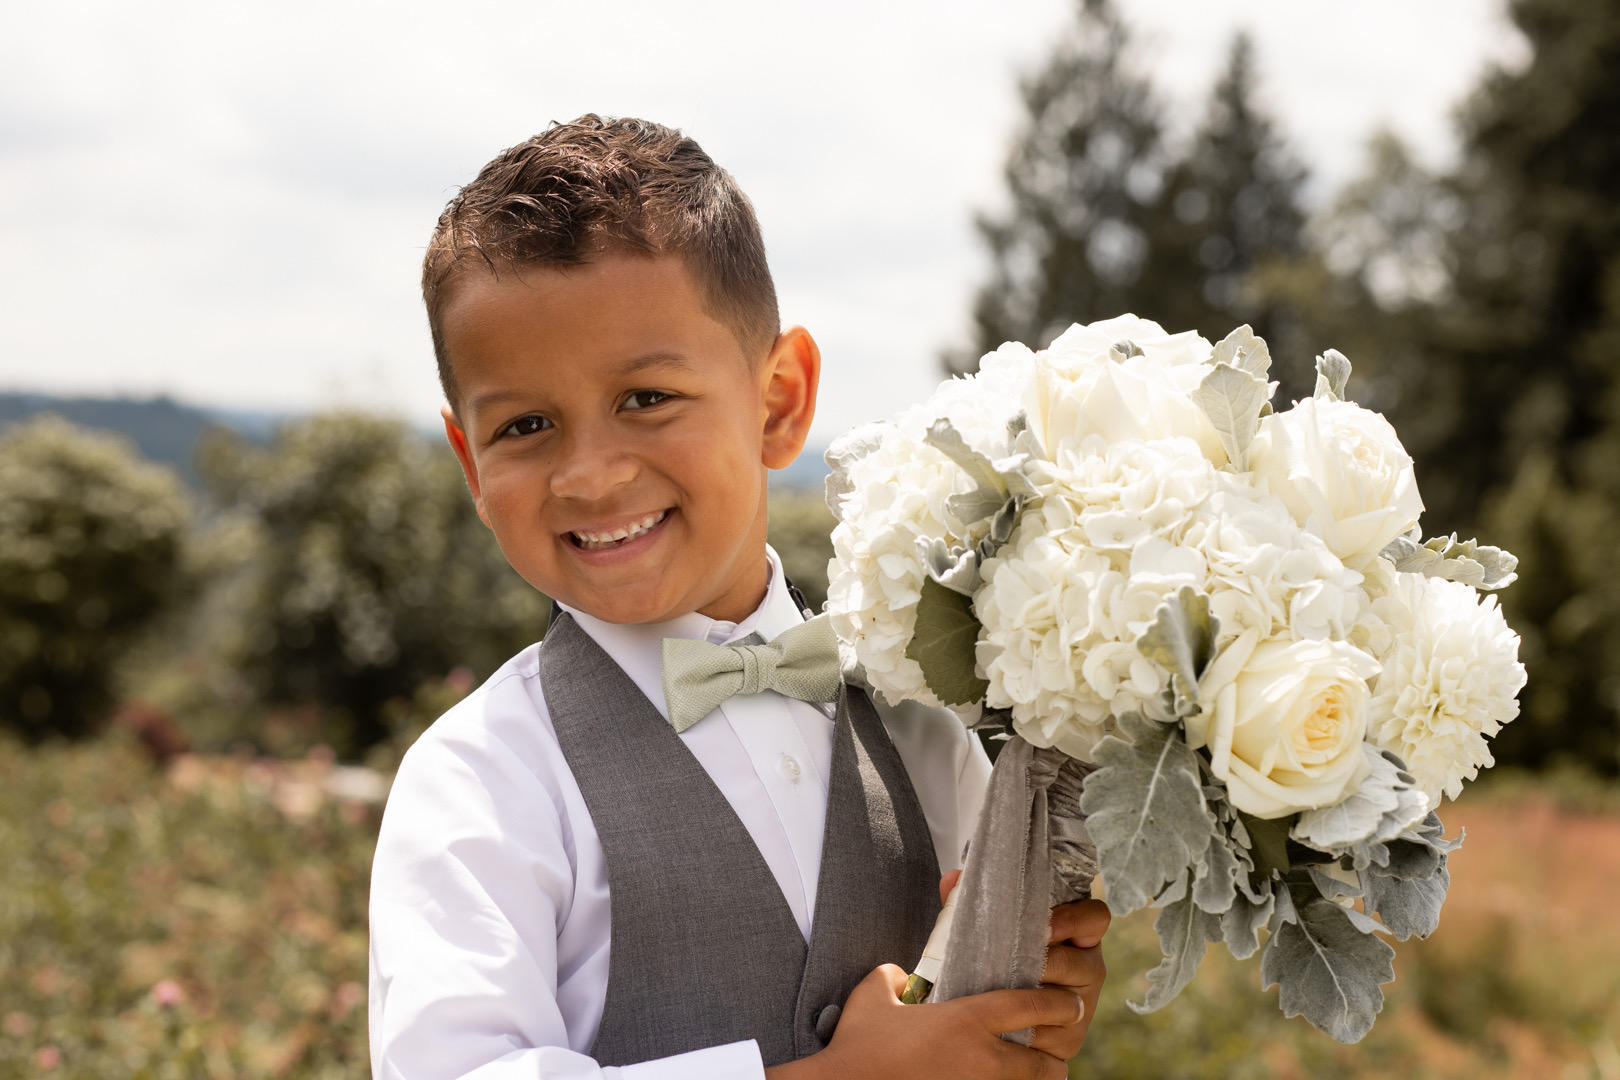 bouquet_boy_pic_xvwrux.jpg